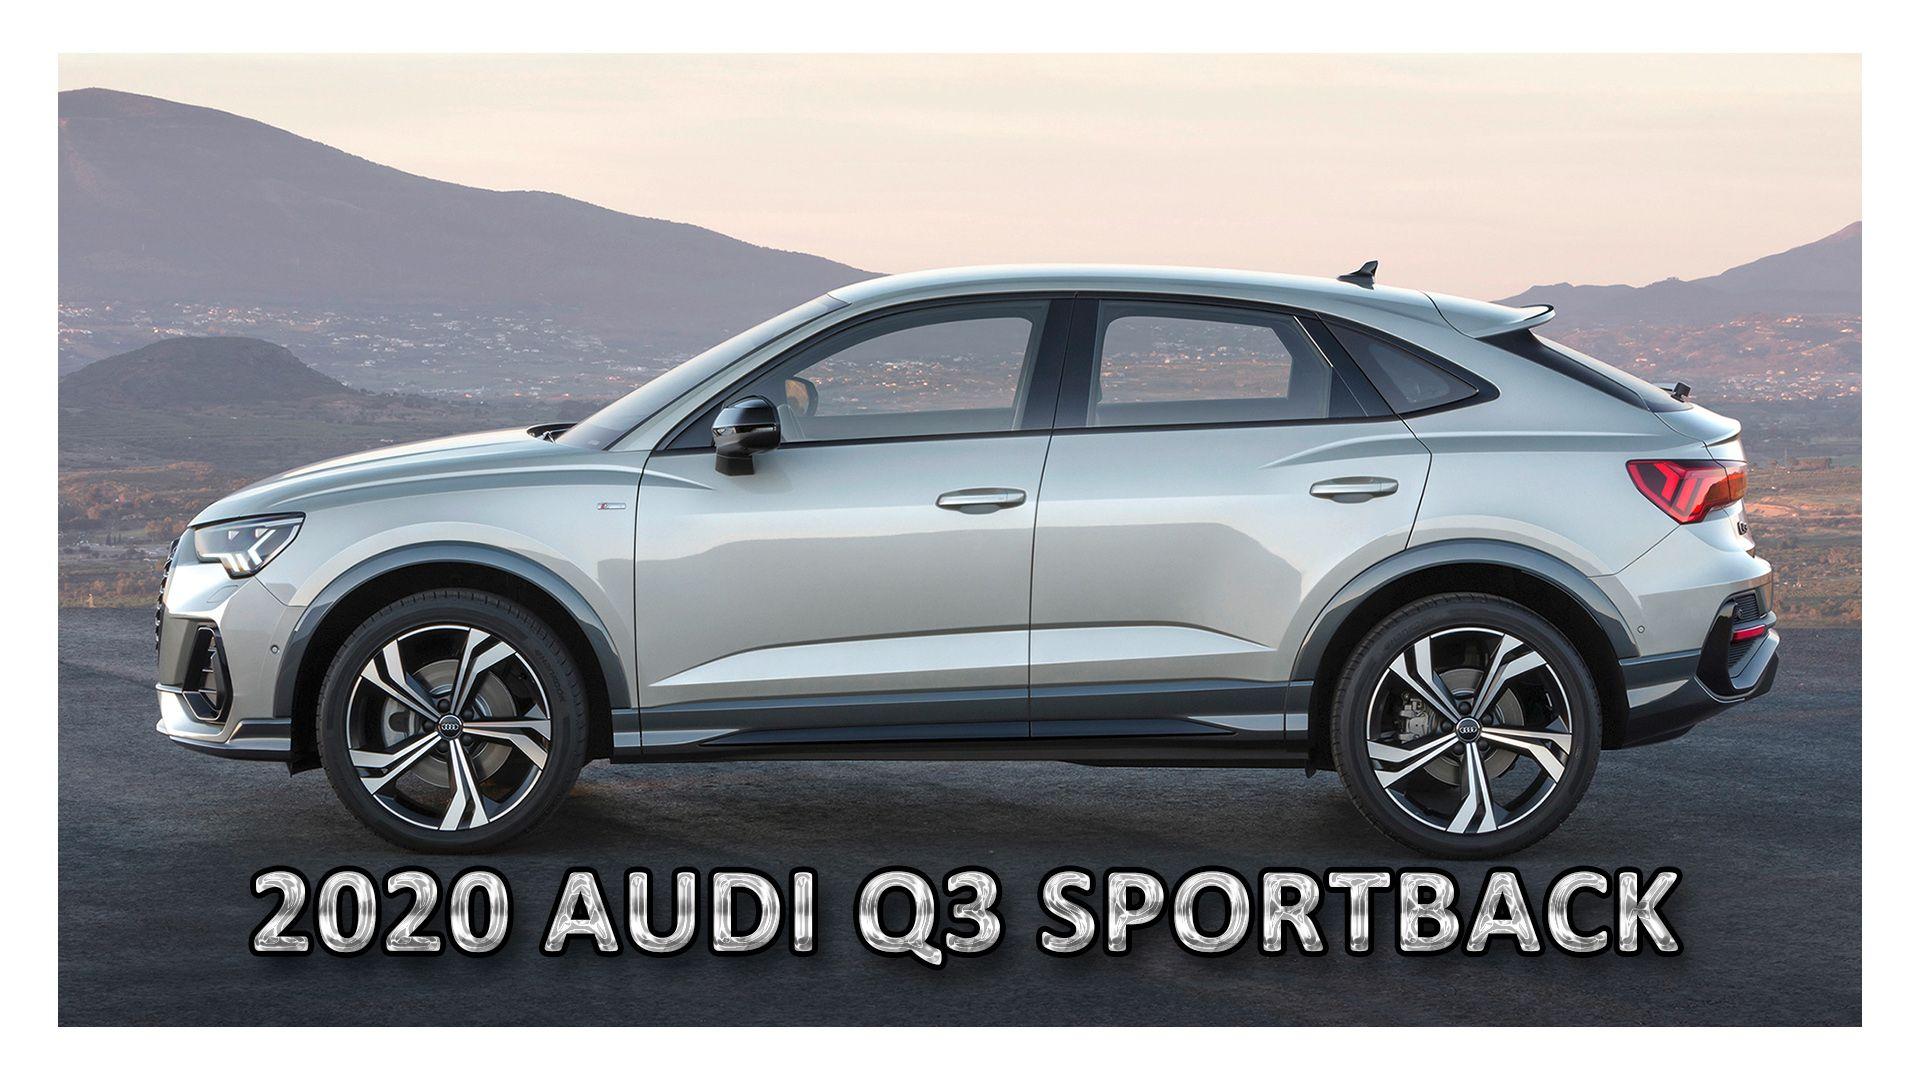 2020 Audi Q3 Sportback Audi Q3 Crossover Cars Audi